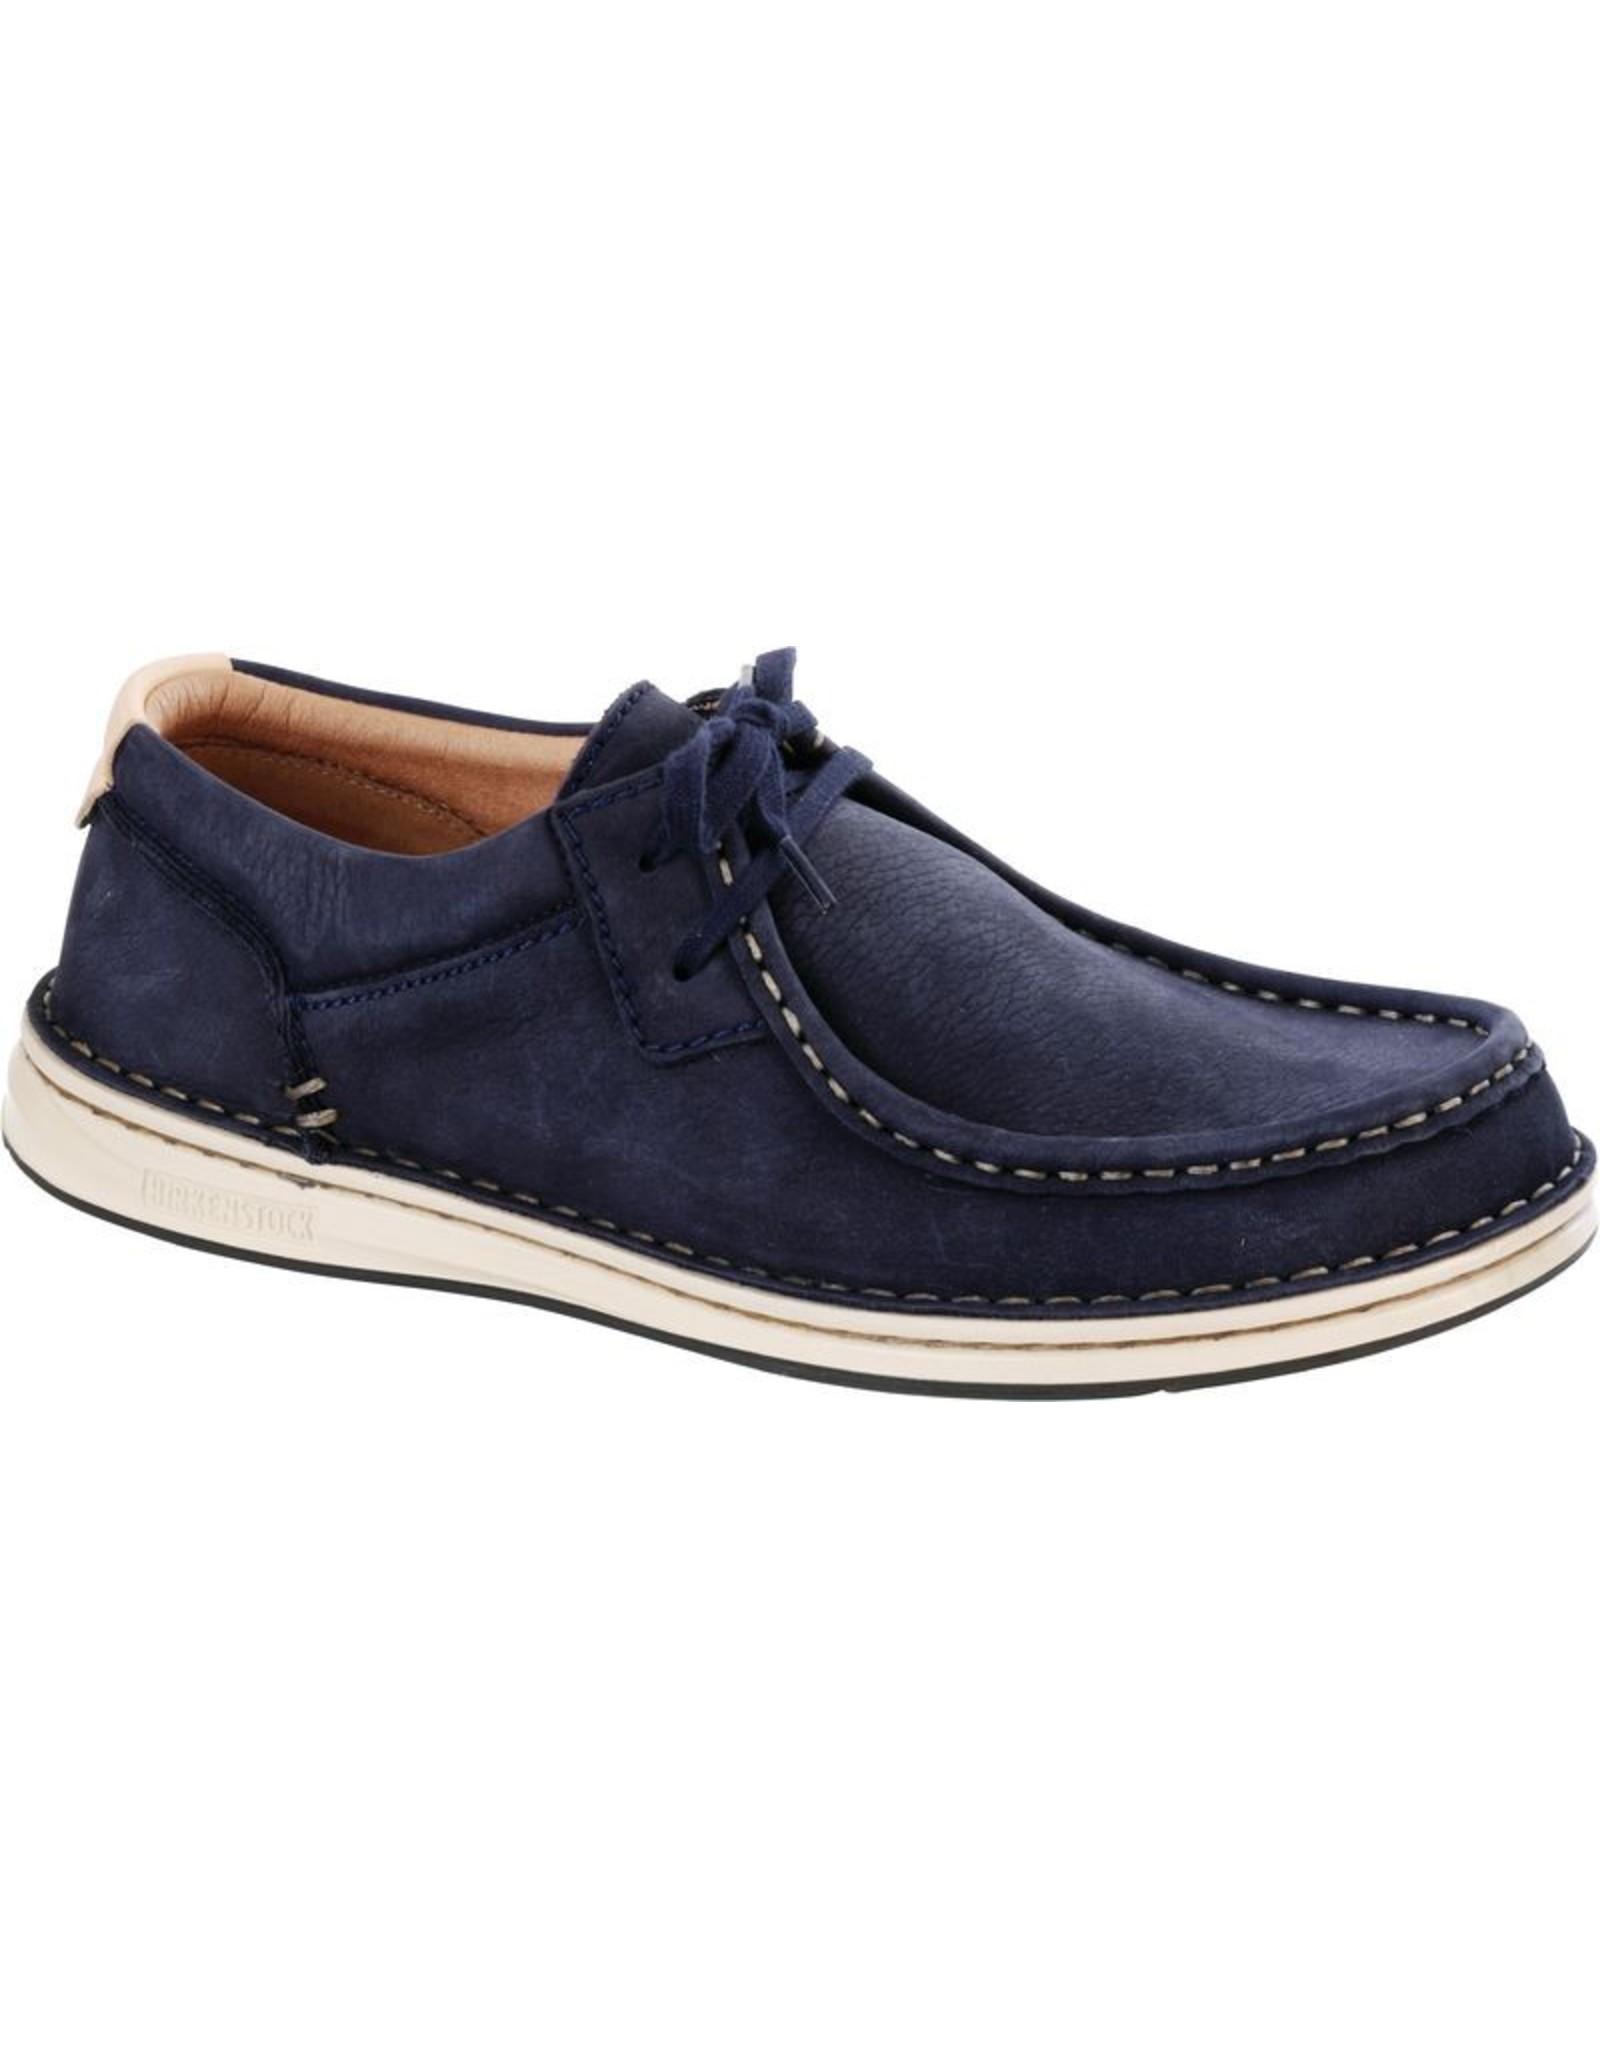 Birkenstock Pasadena Nubuck Leather Shoe